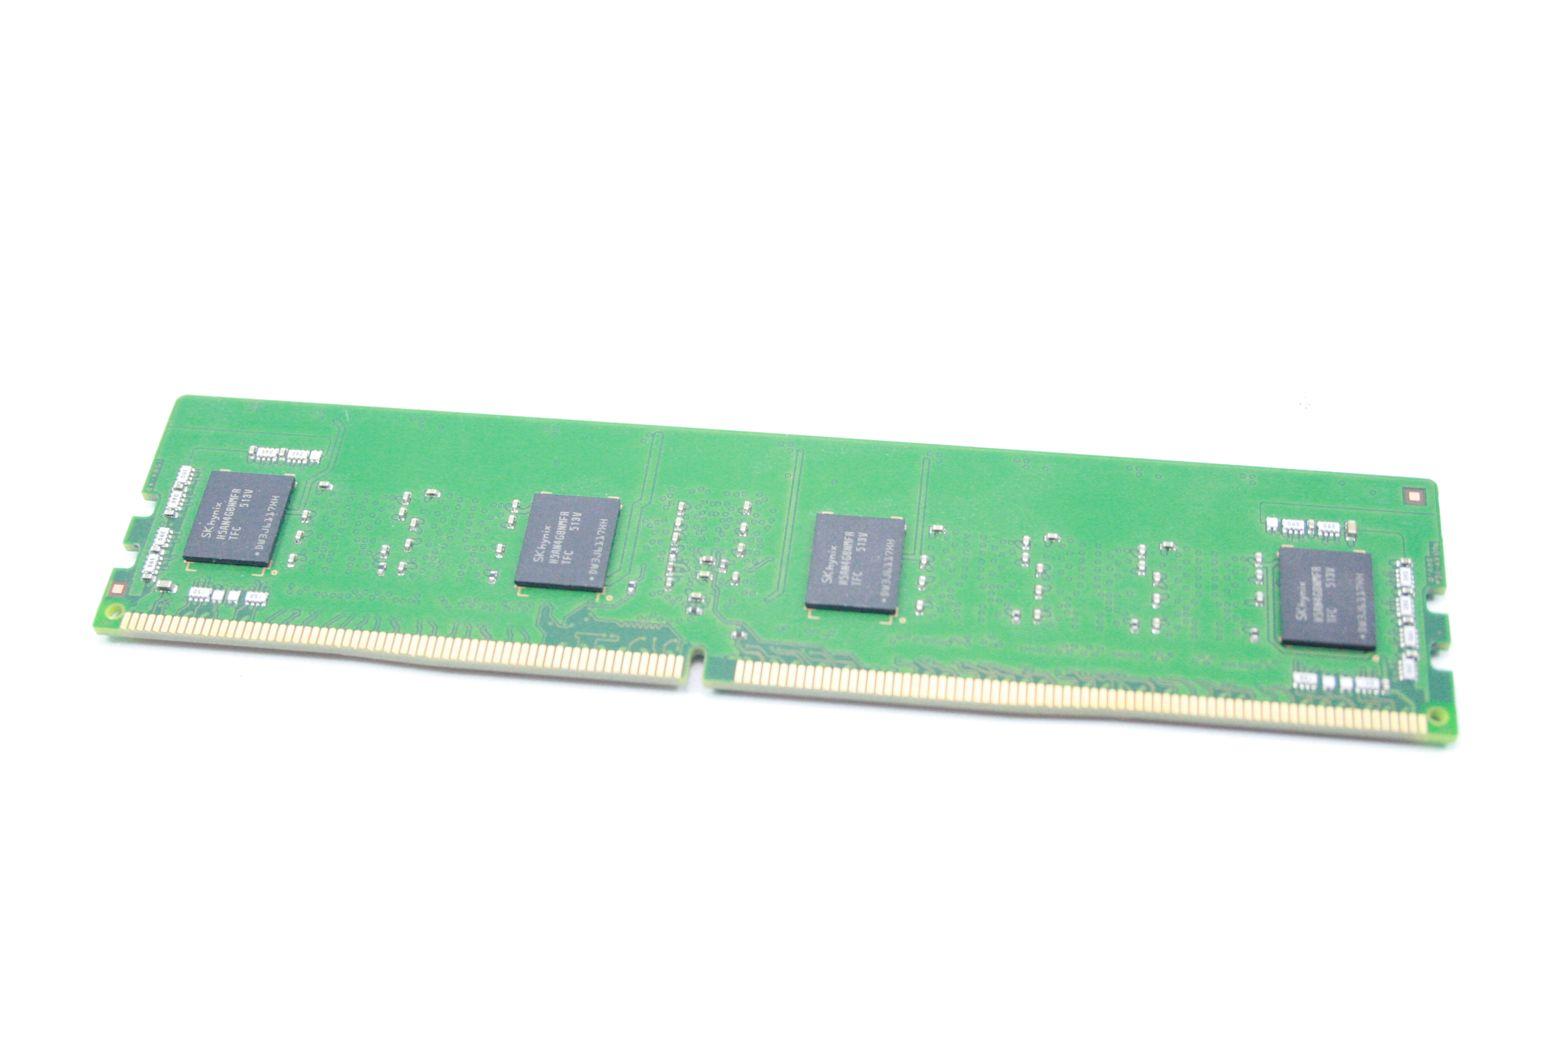 HPE G10 64GB 4R *4 PC4-21300 DDR4 Load Reduced Memory Kit (1x64GB)